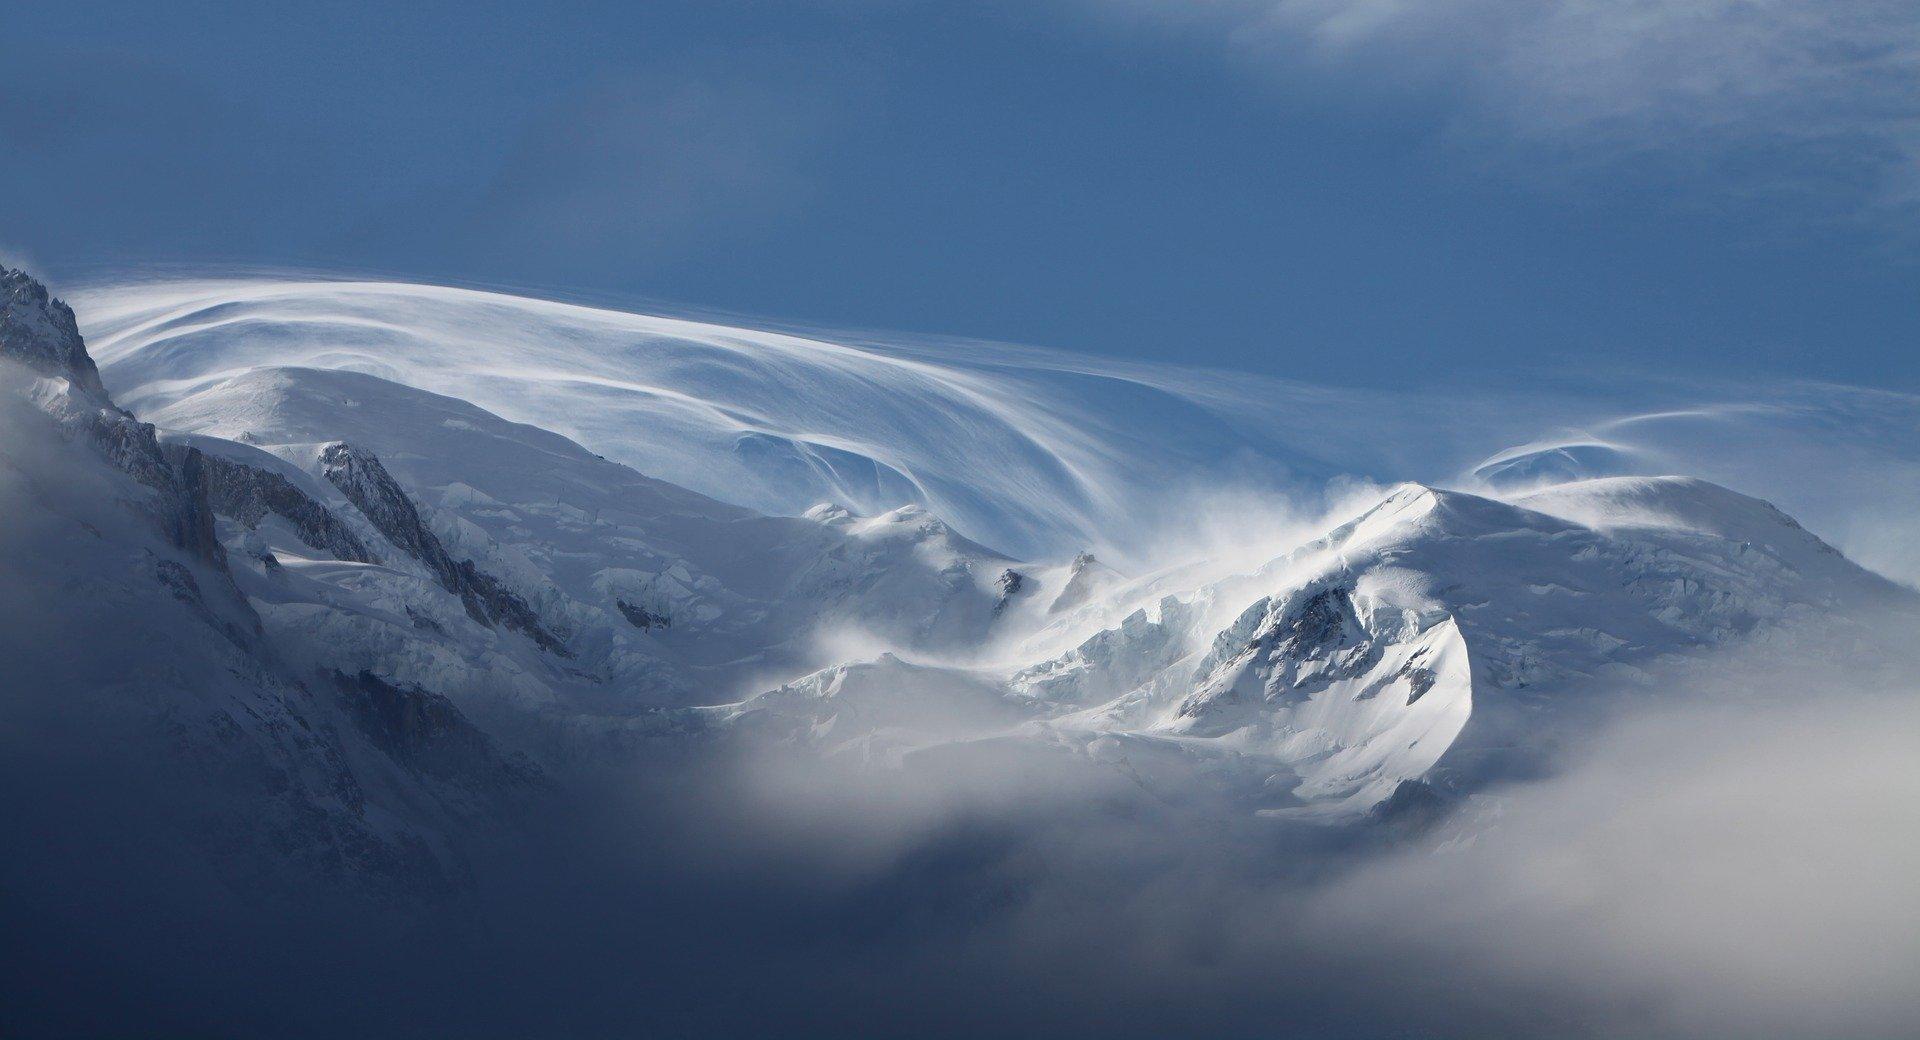 Piste da sci Chamonix